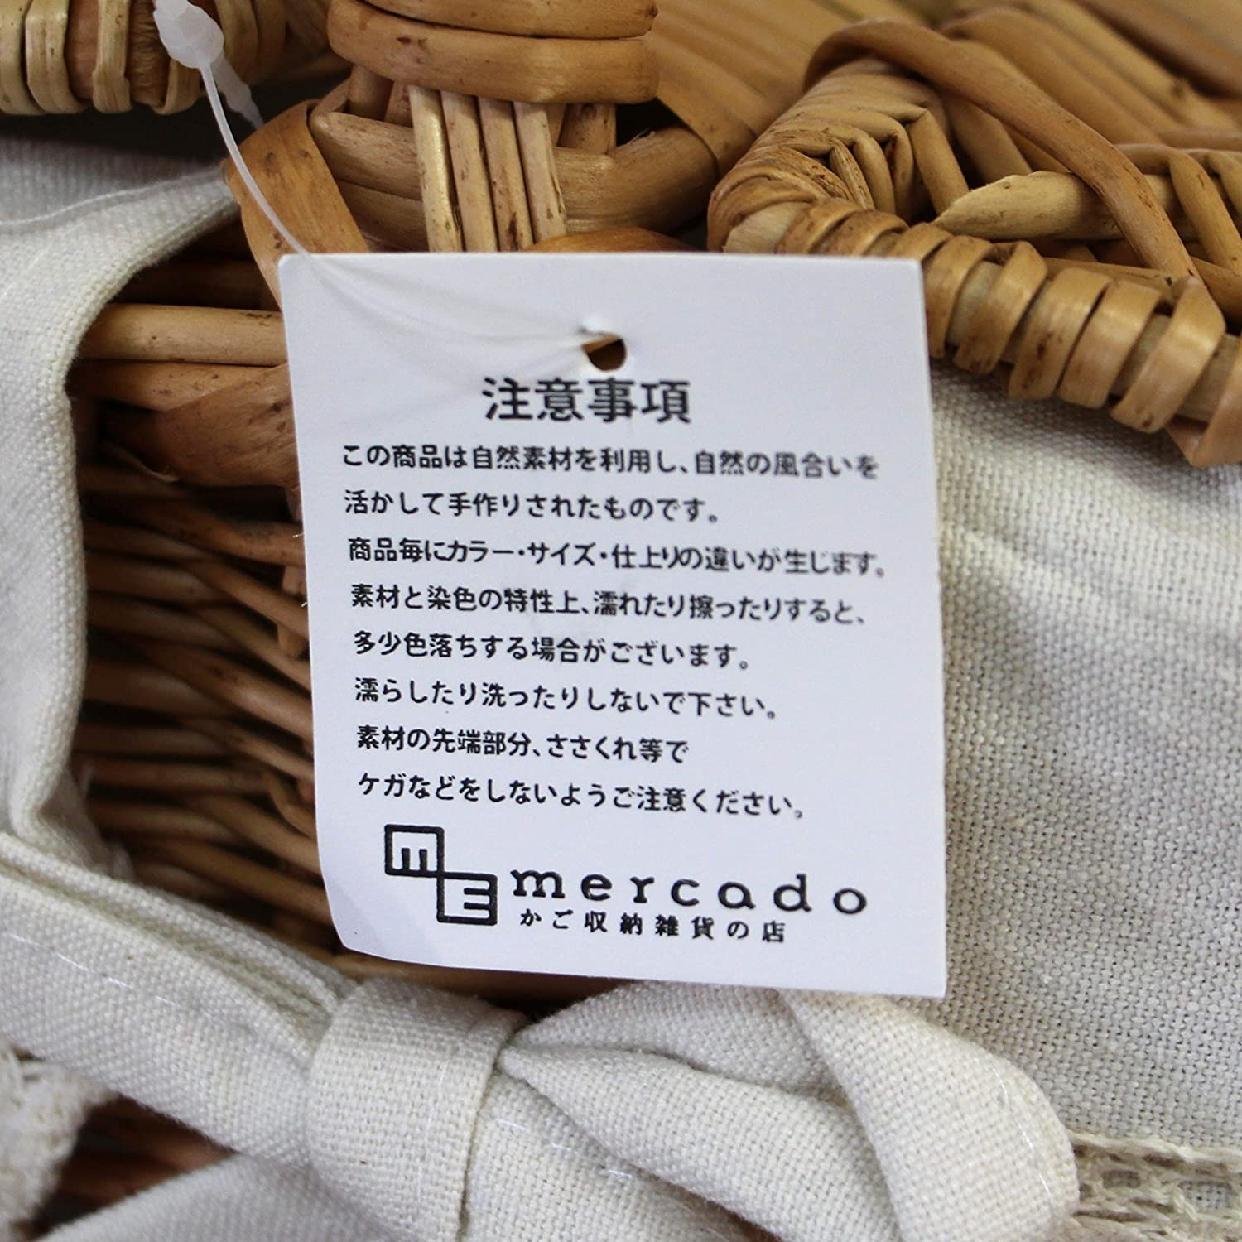 mercado(メルカド)フタ付き ウィッカー ピクニック バスケット (レース) ナチュラルの商品画像6